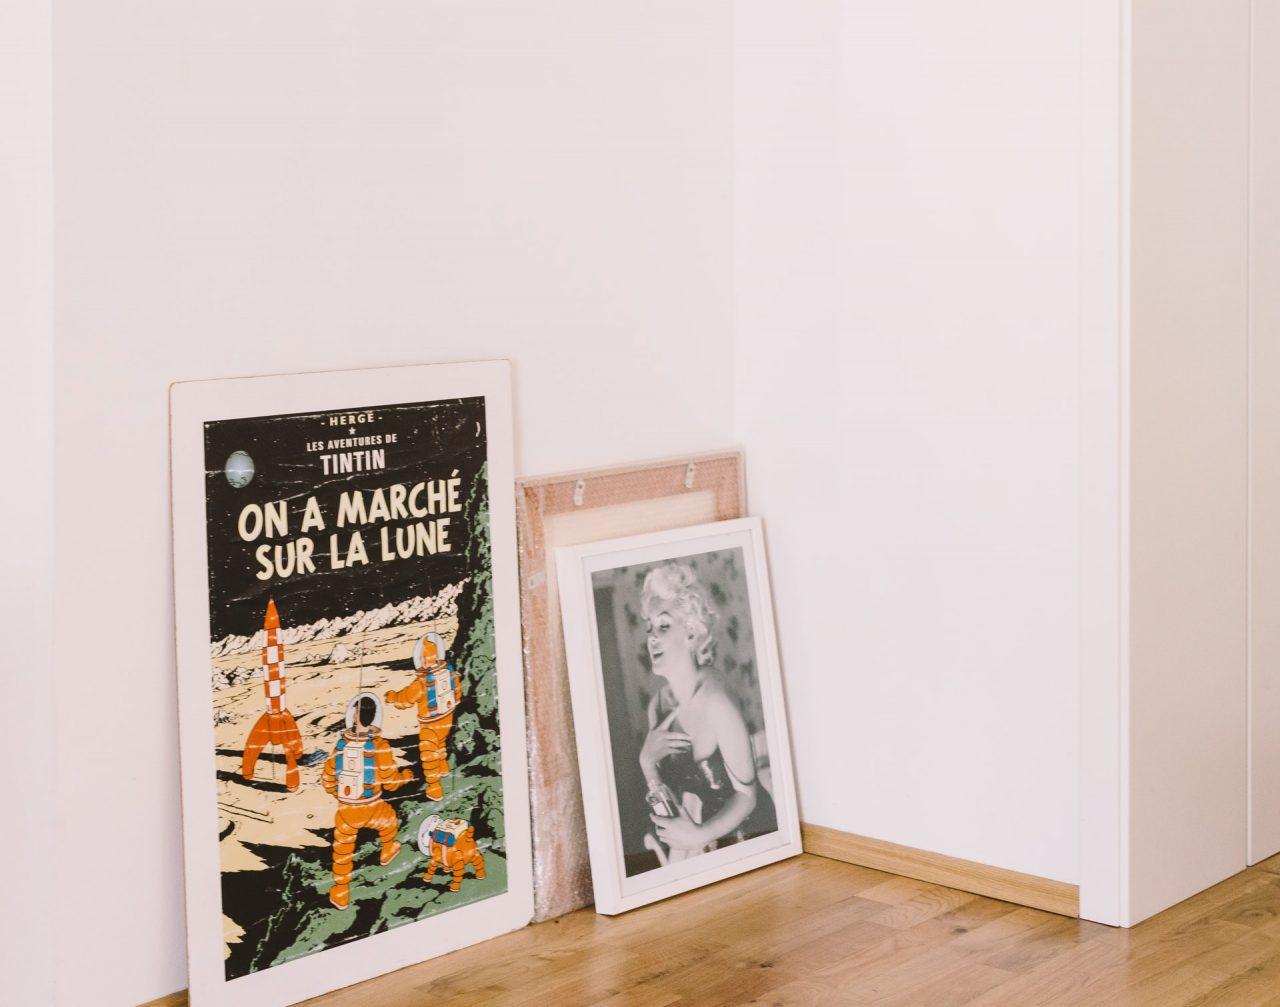 Plakatrammer